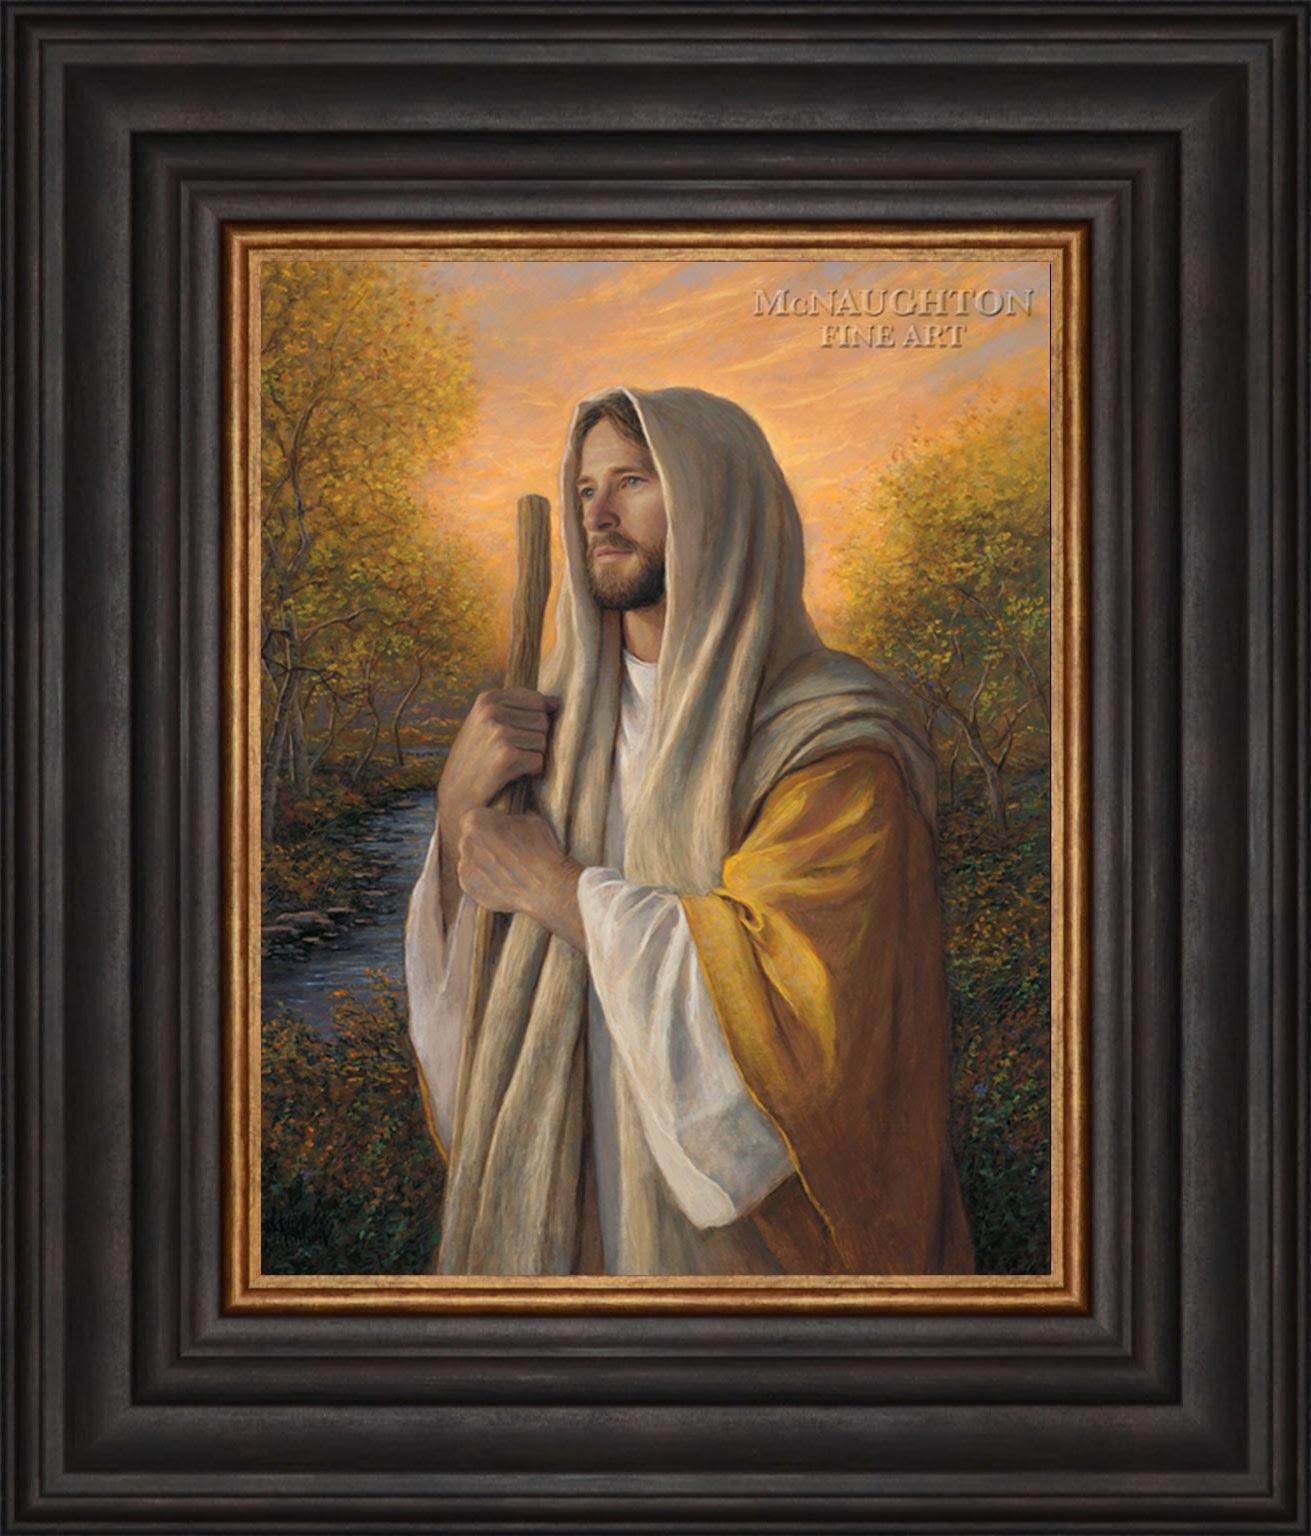 http://www.jonmcnaughton.com/loving-savior-facebook-special-p13/